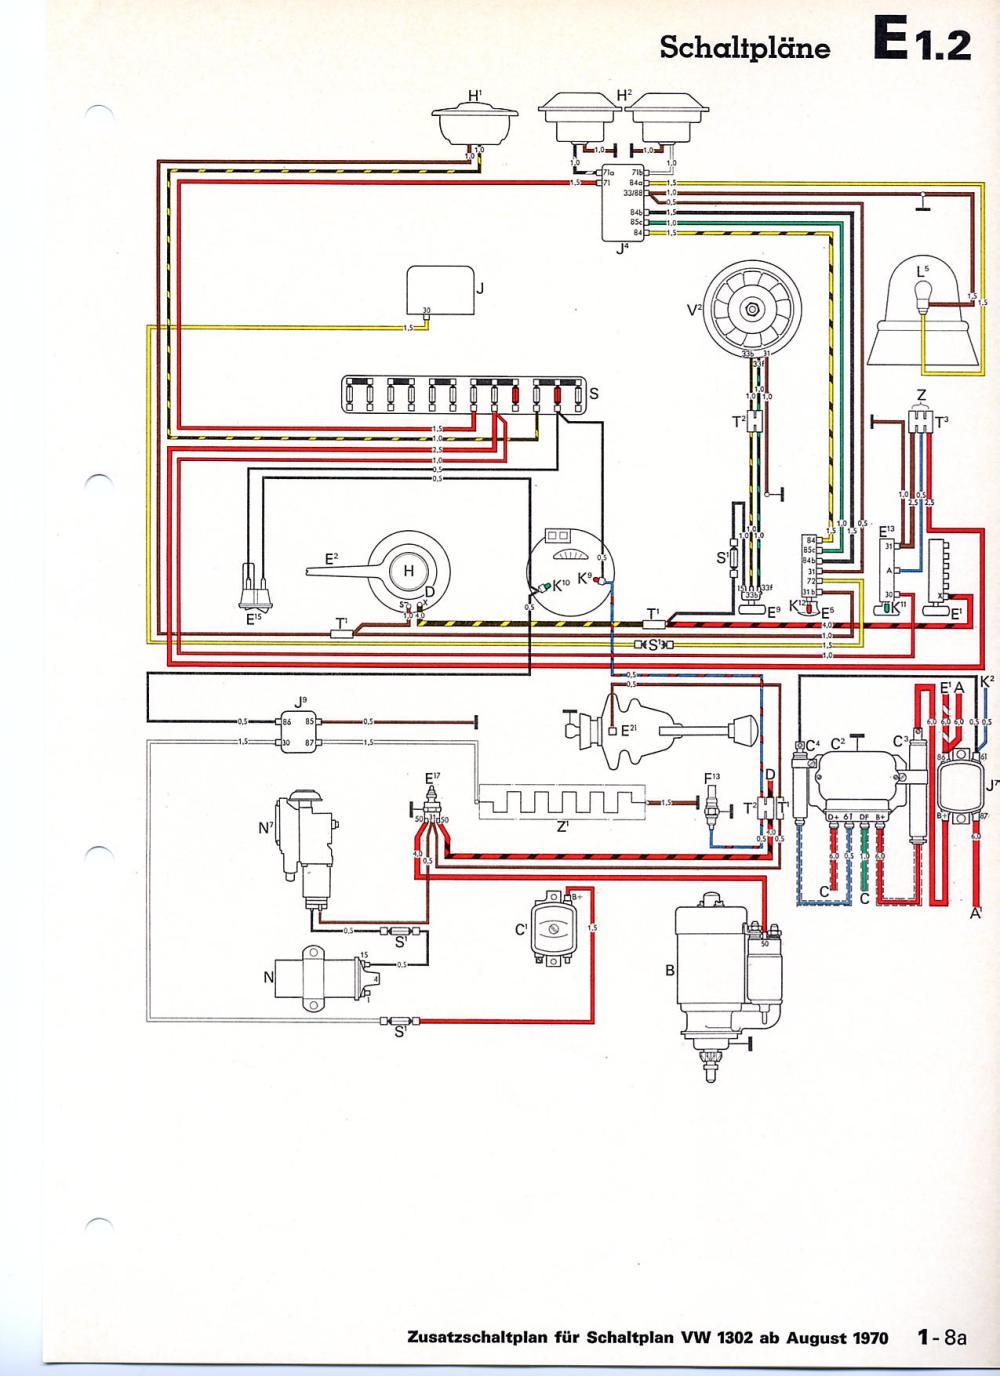 medium resolution of 71 standard wrong ignition switch shoptalkforums comwww vintagebus com wiring 1302 f items jpg